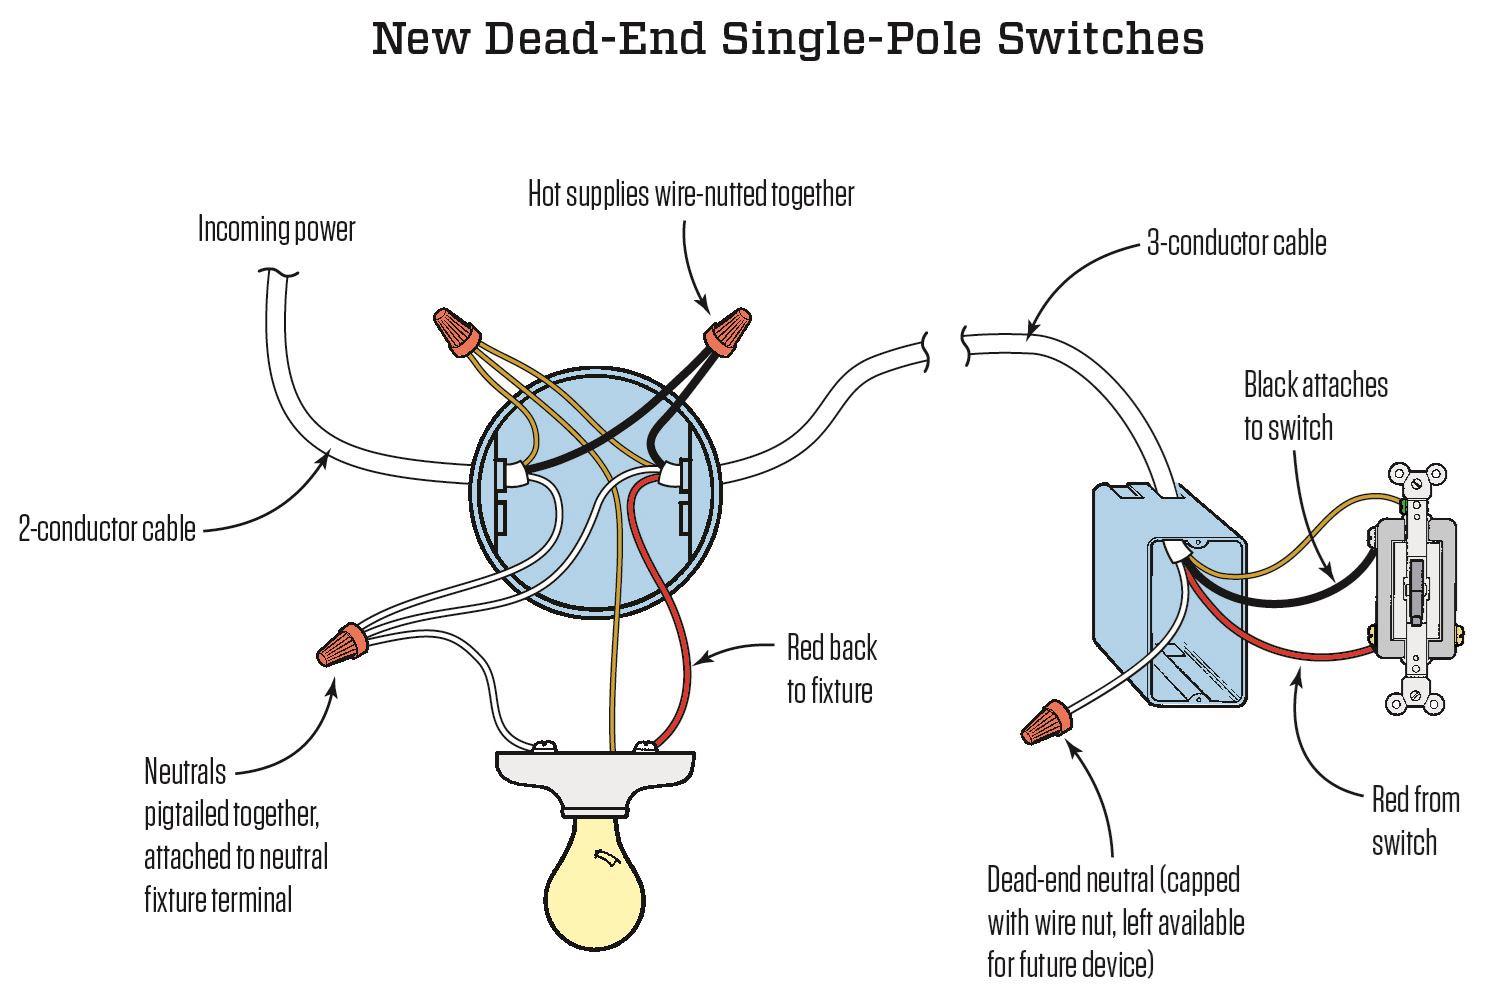 Dead-End Single Pole Switches   Jlc Online   Electrical, Electrical - Single Pole Switch Wiring Diagram